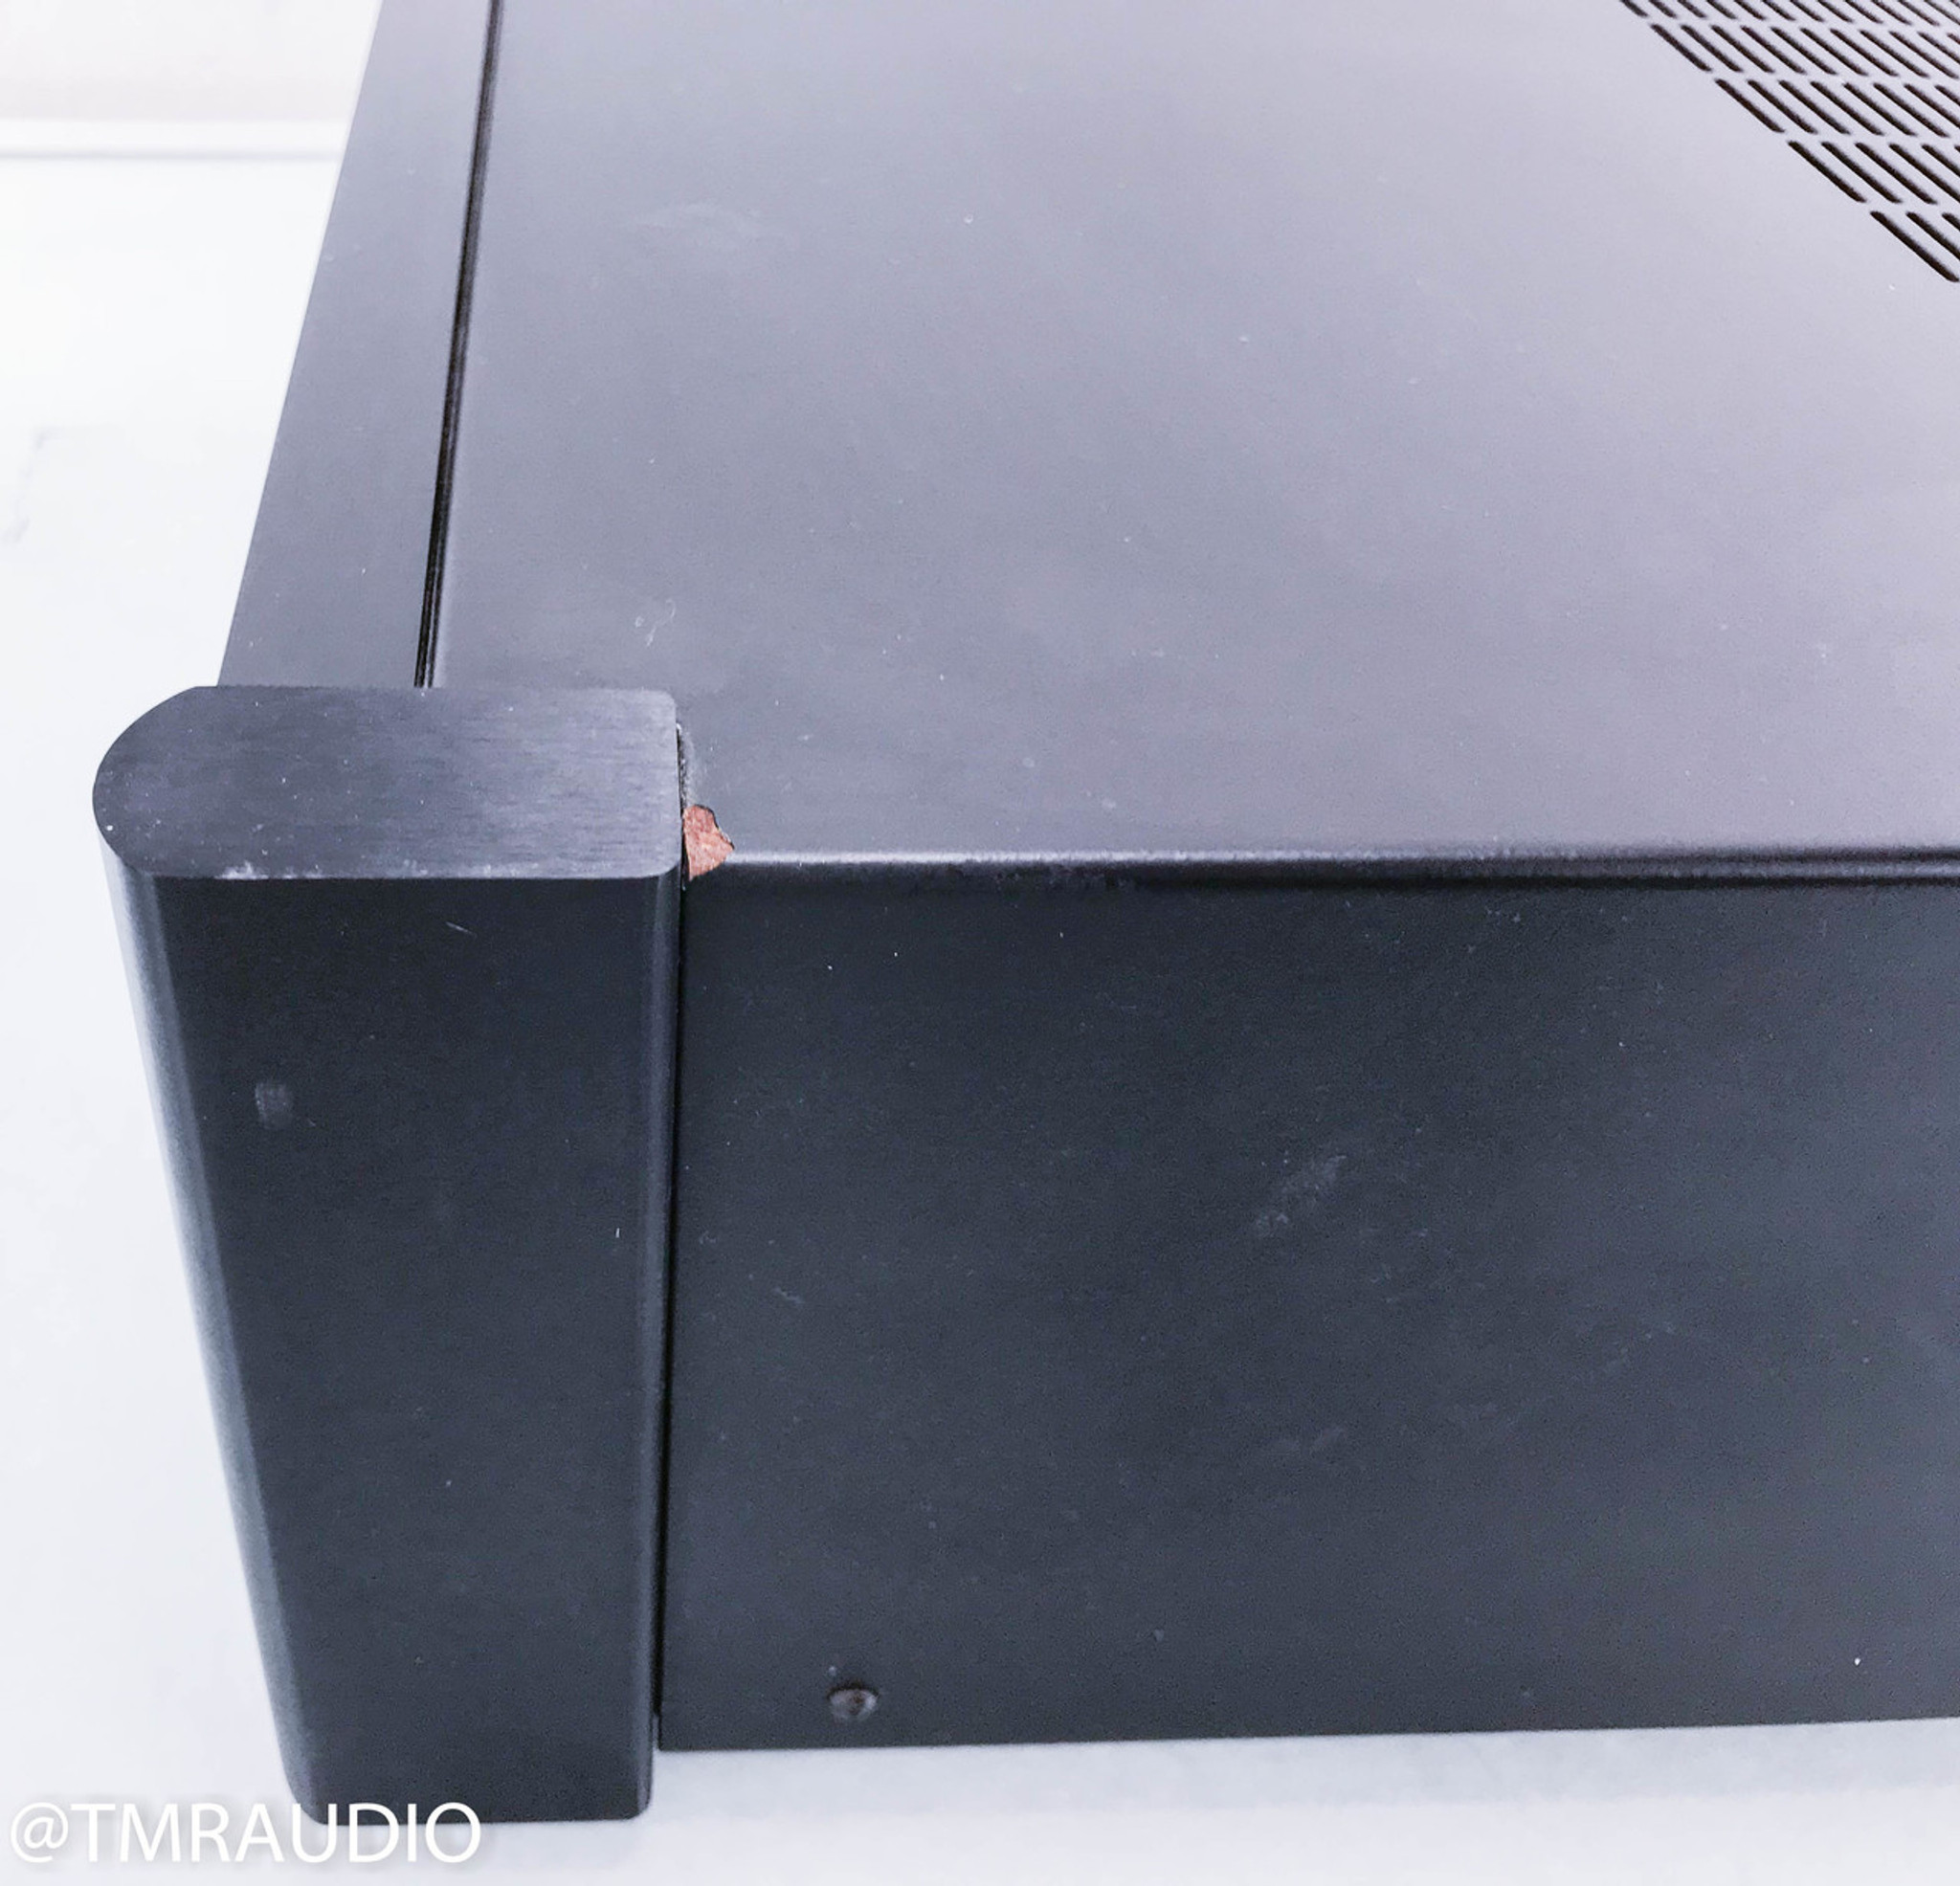 Kinergetics Kba 380 3 Channel Power Amplifier 2 The Music Room 140w